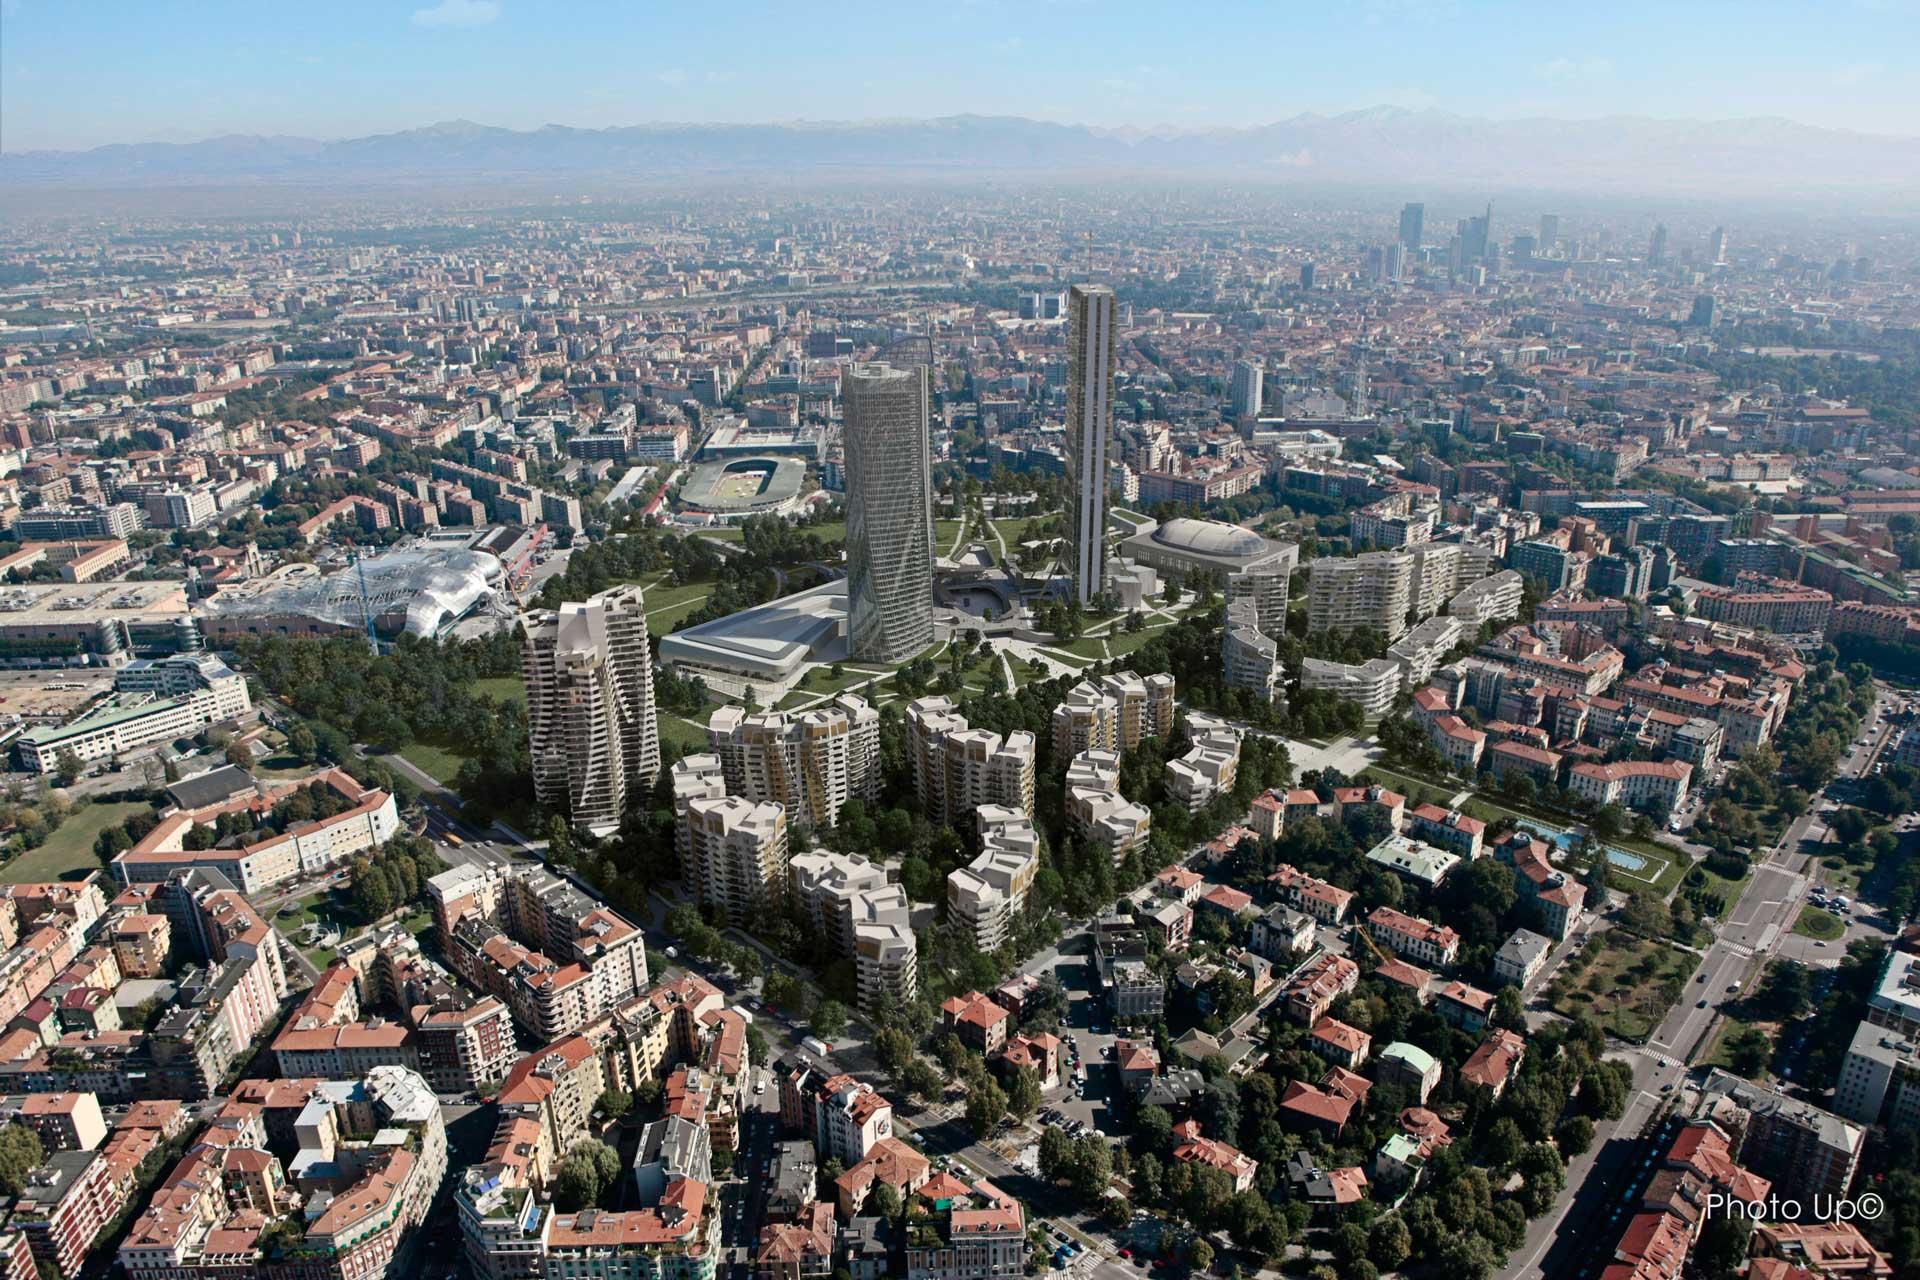 ZHA_Citylife_Generali-Tower_Milan_Aerial-View-1